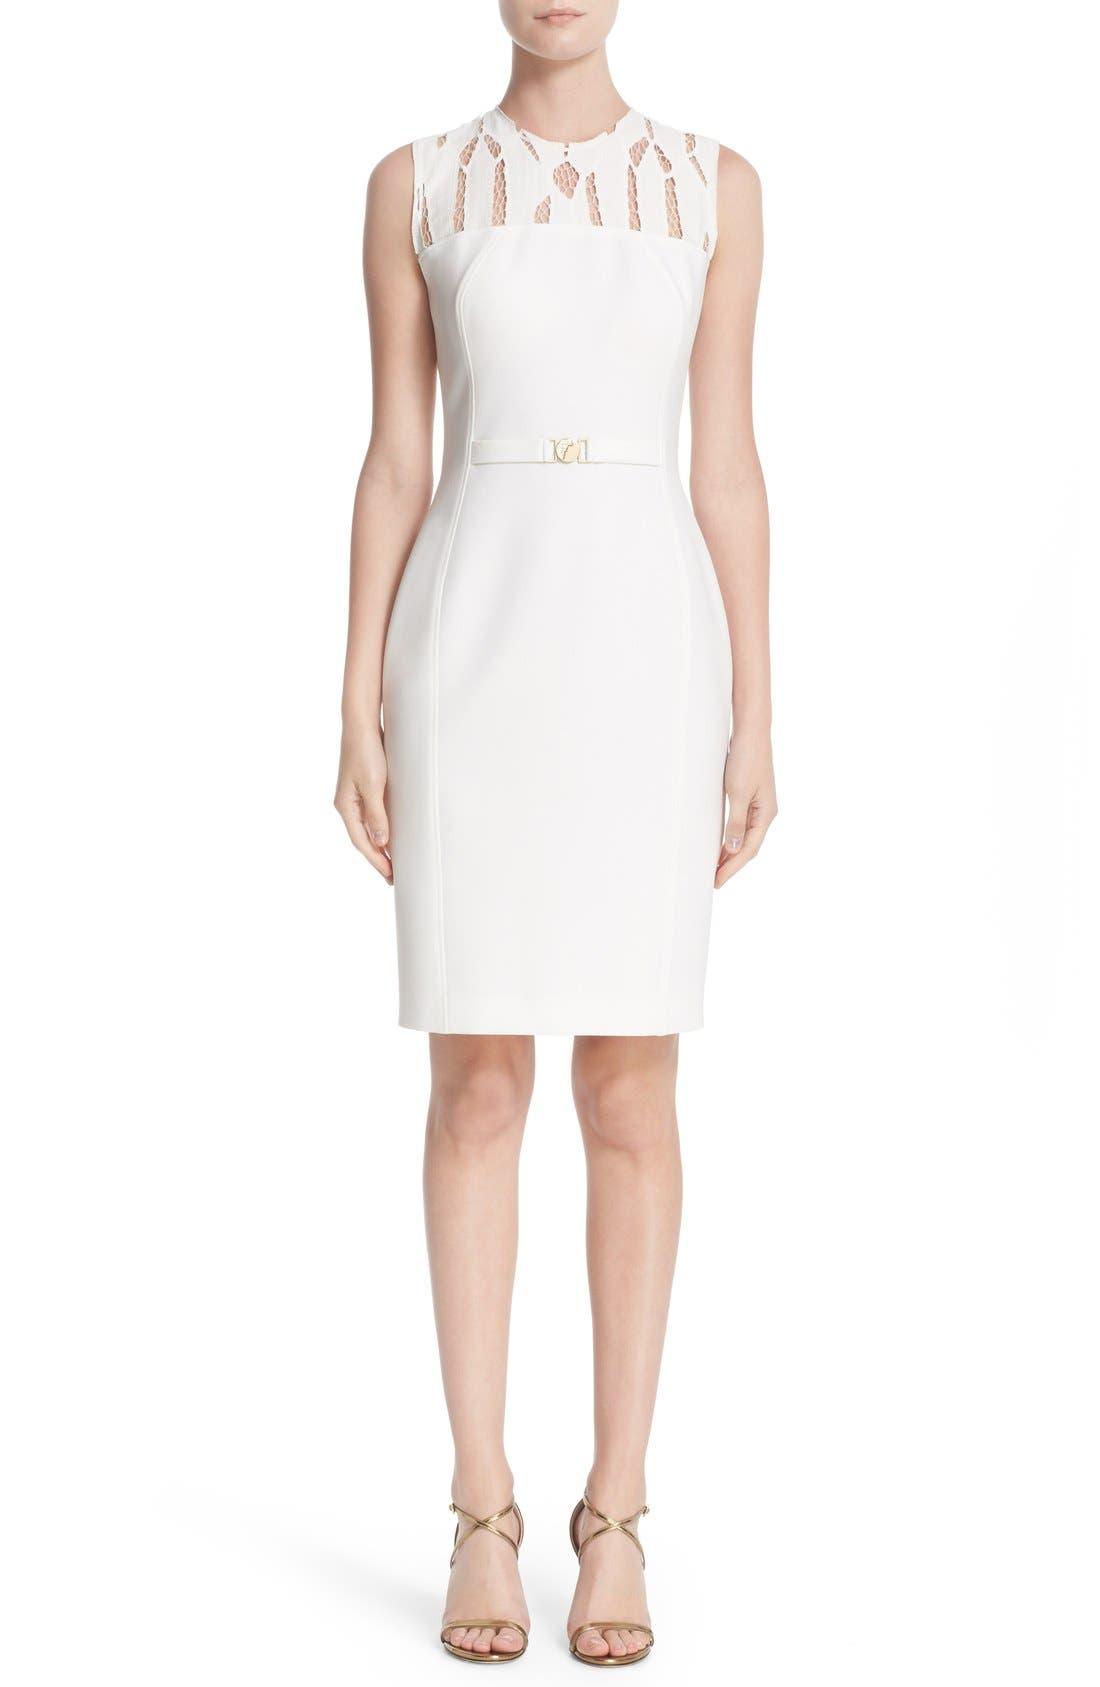 Alternate Image 1 Selected - Versace Cutout Bodice Stretch Cady Sheath Dress